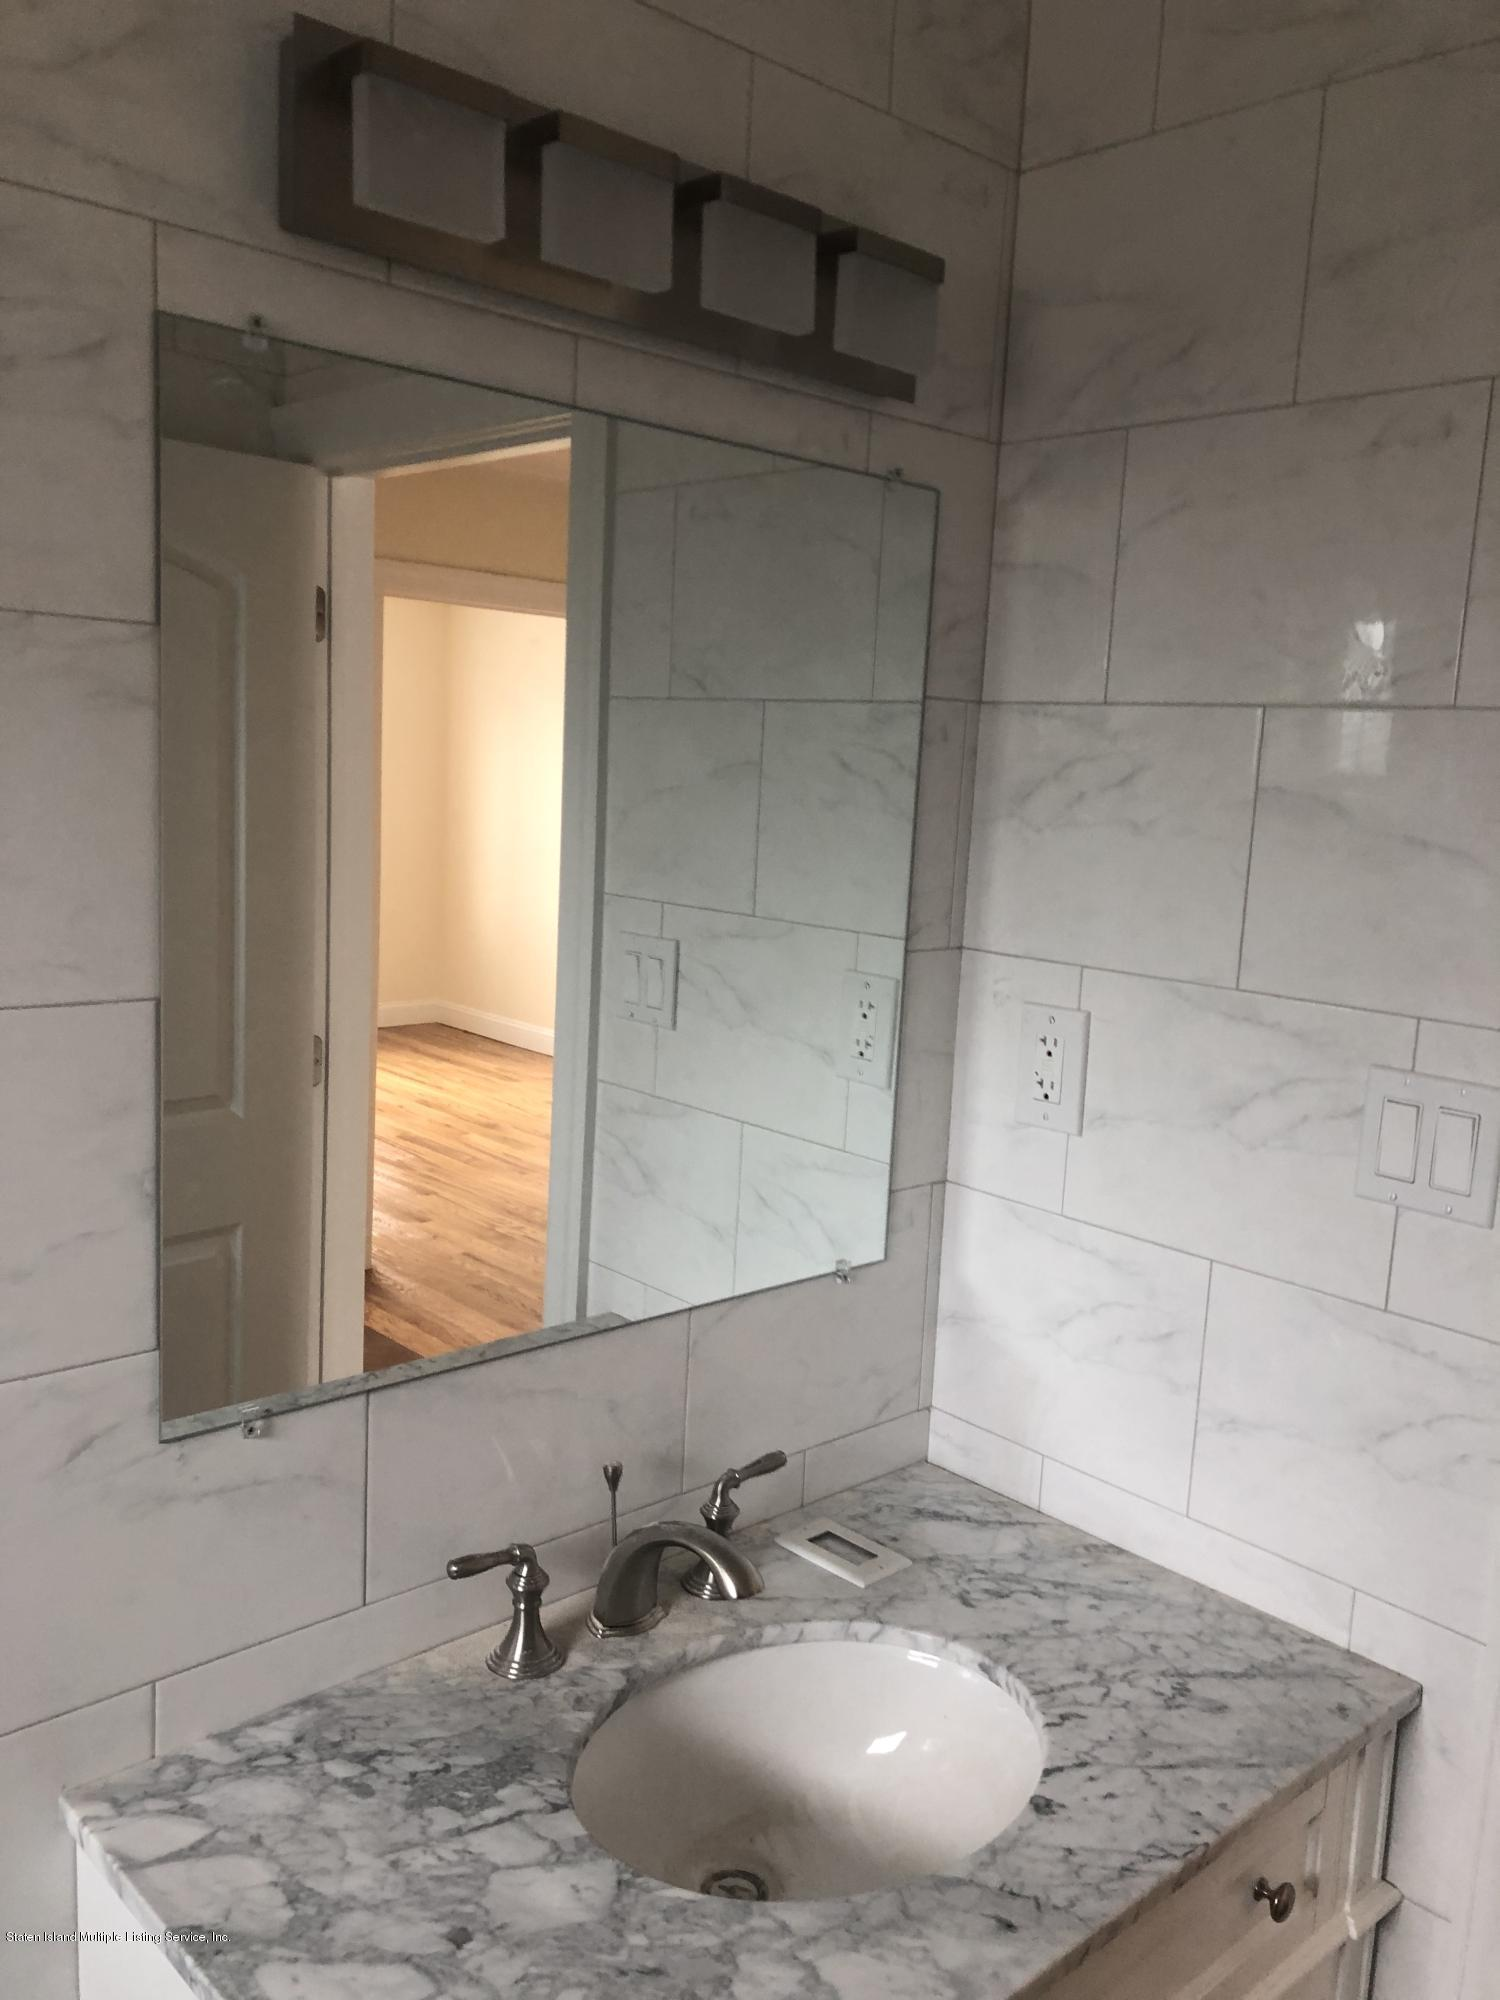 1 309 Bryson Avenue,Staten Island,New York,10314,United States,3 Bedrooms Bedrooms,6 Rooms Rooms,1 BathroomBathrooms,Res-Rental,Bryson,1136556